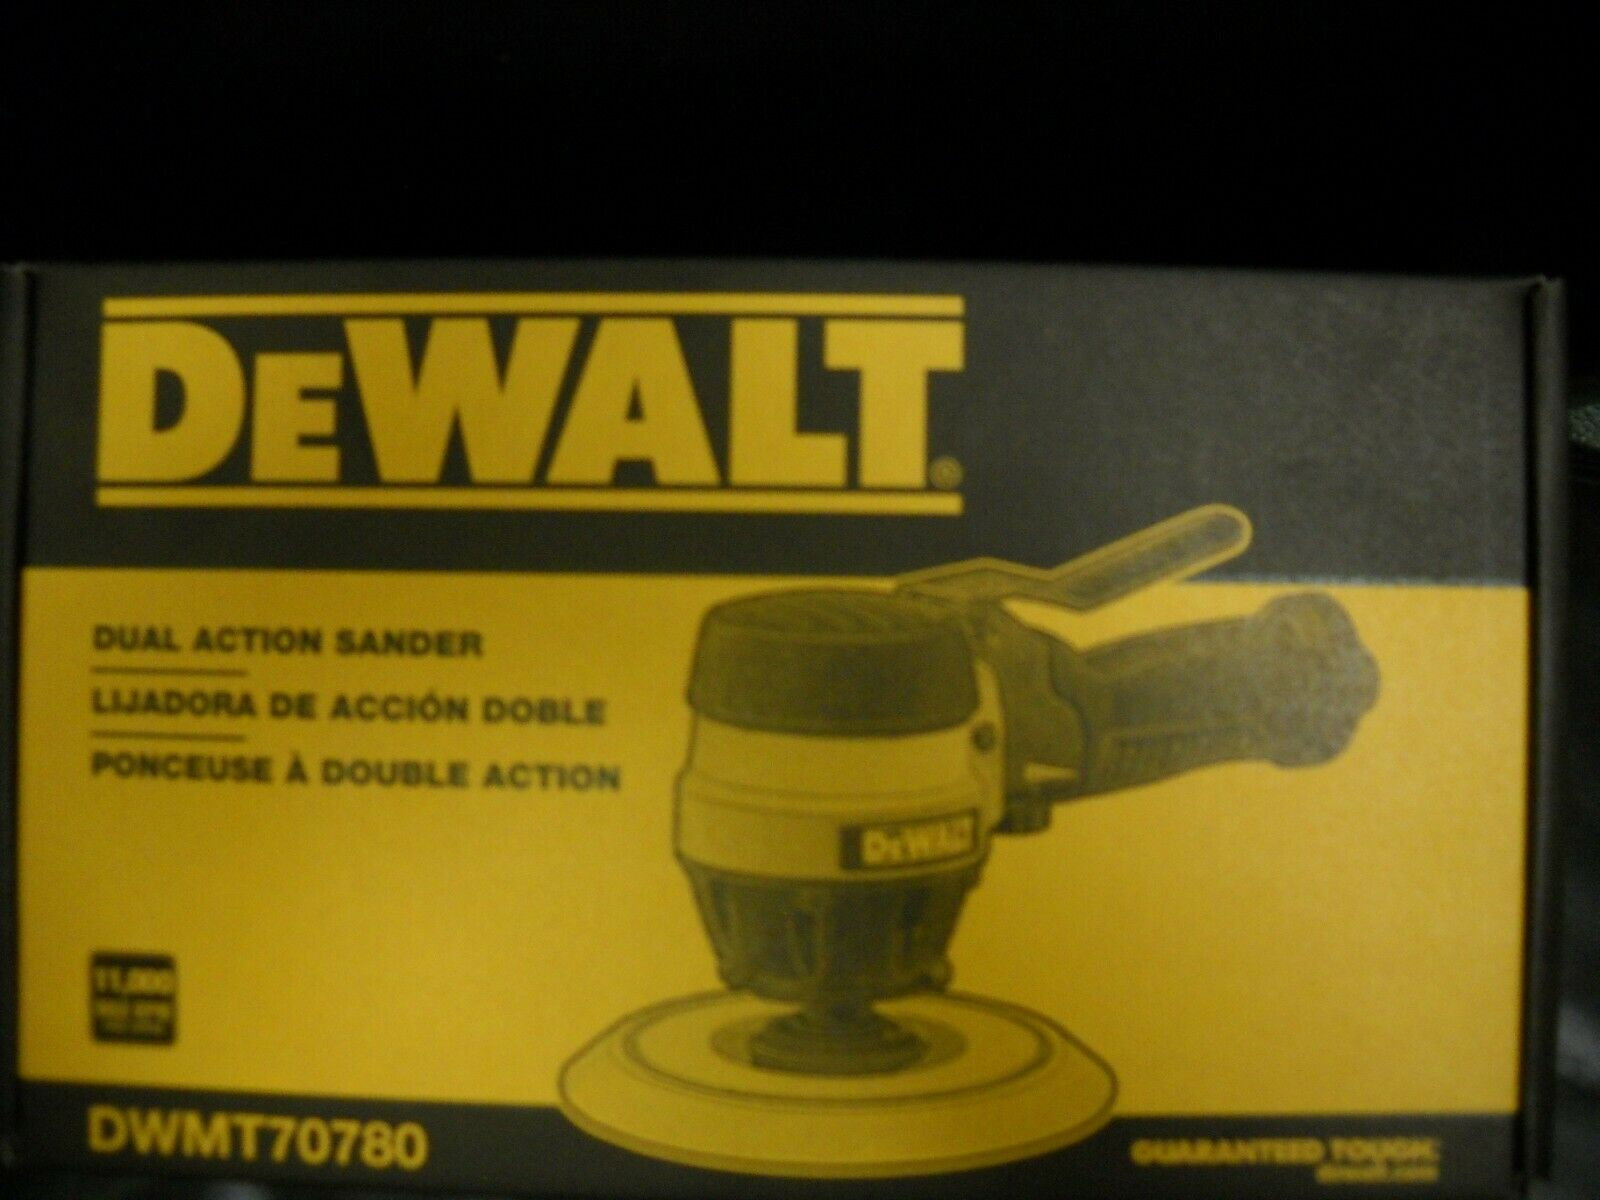 DWMT70780 scenterprises4408 DeWalt DWMT70780 6 Pneumatic Orbital Air Sander 11000 RPM Dual Action Keyless